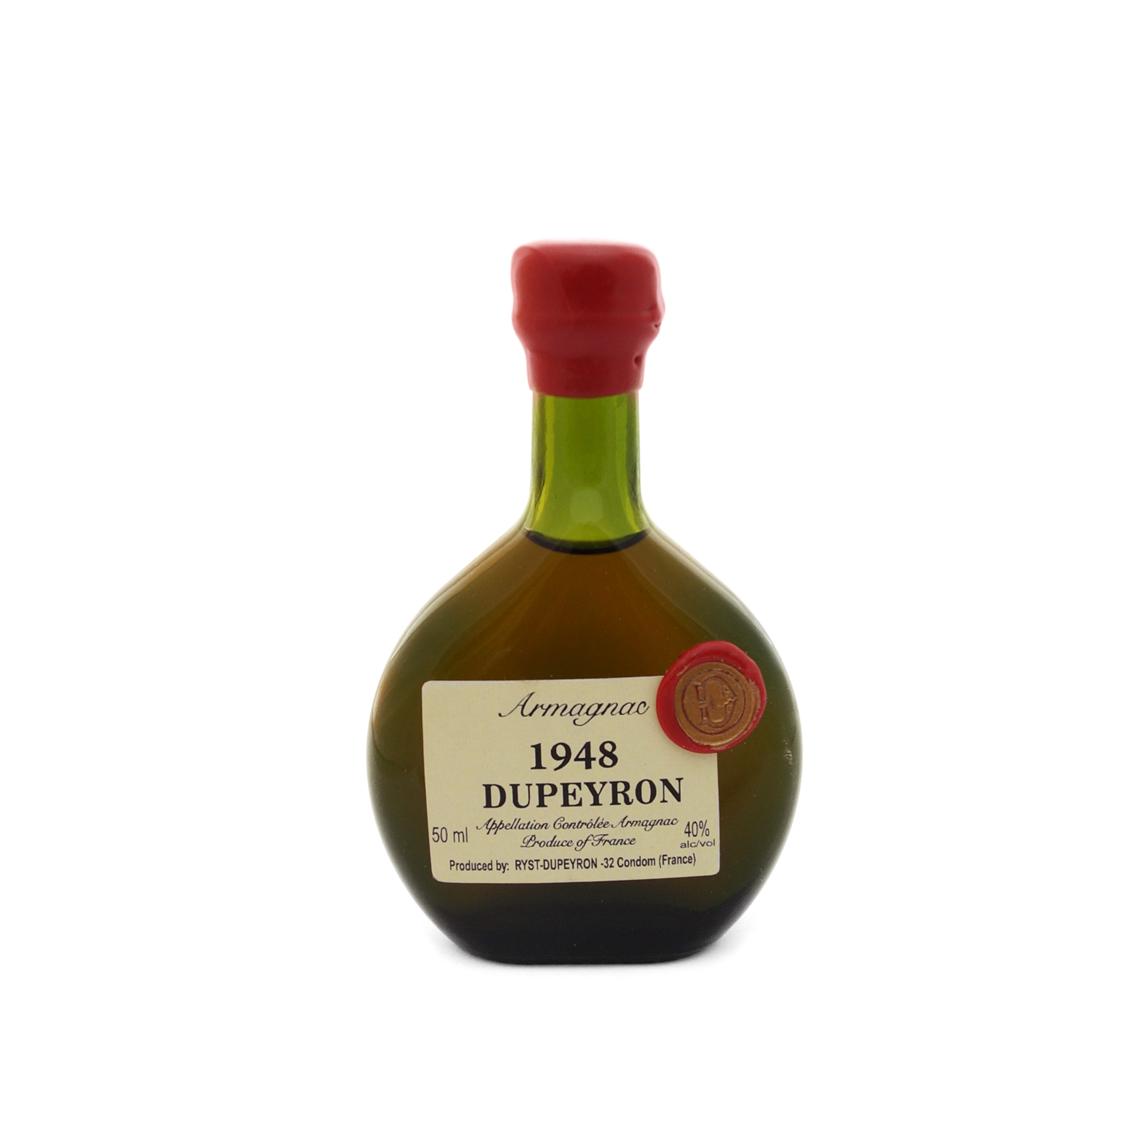 ARMAGNAC-DUPEYRON-1948